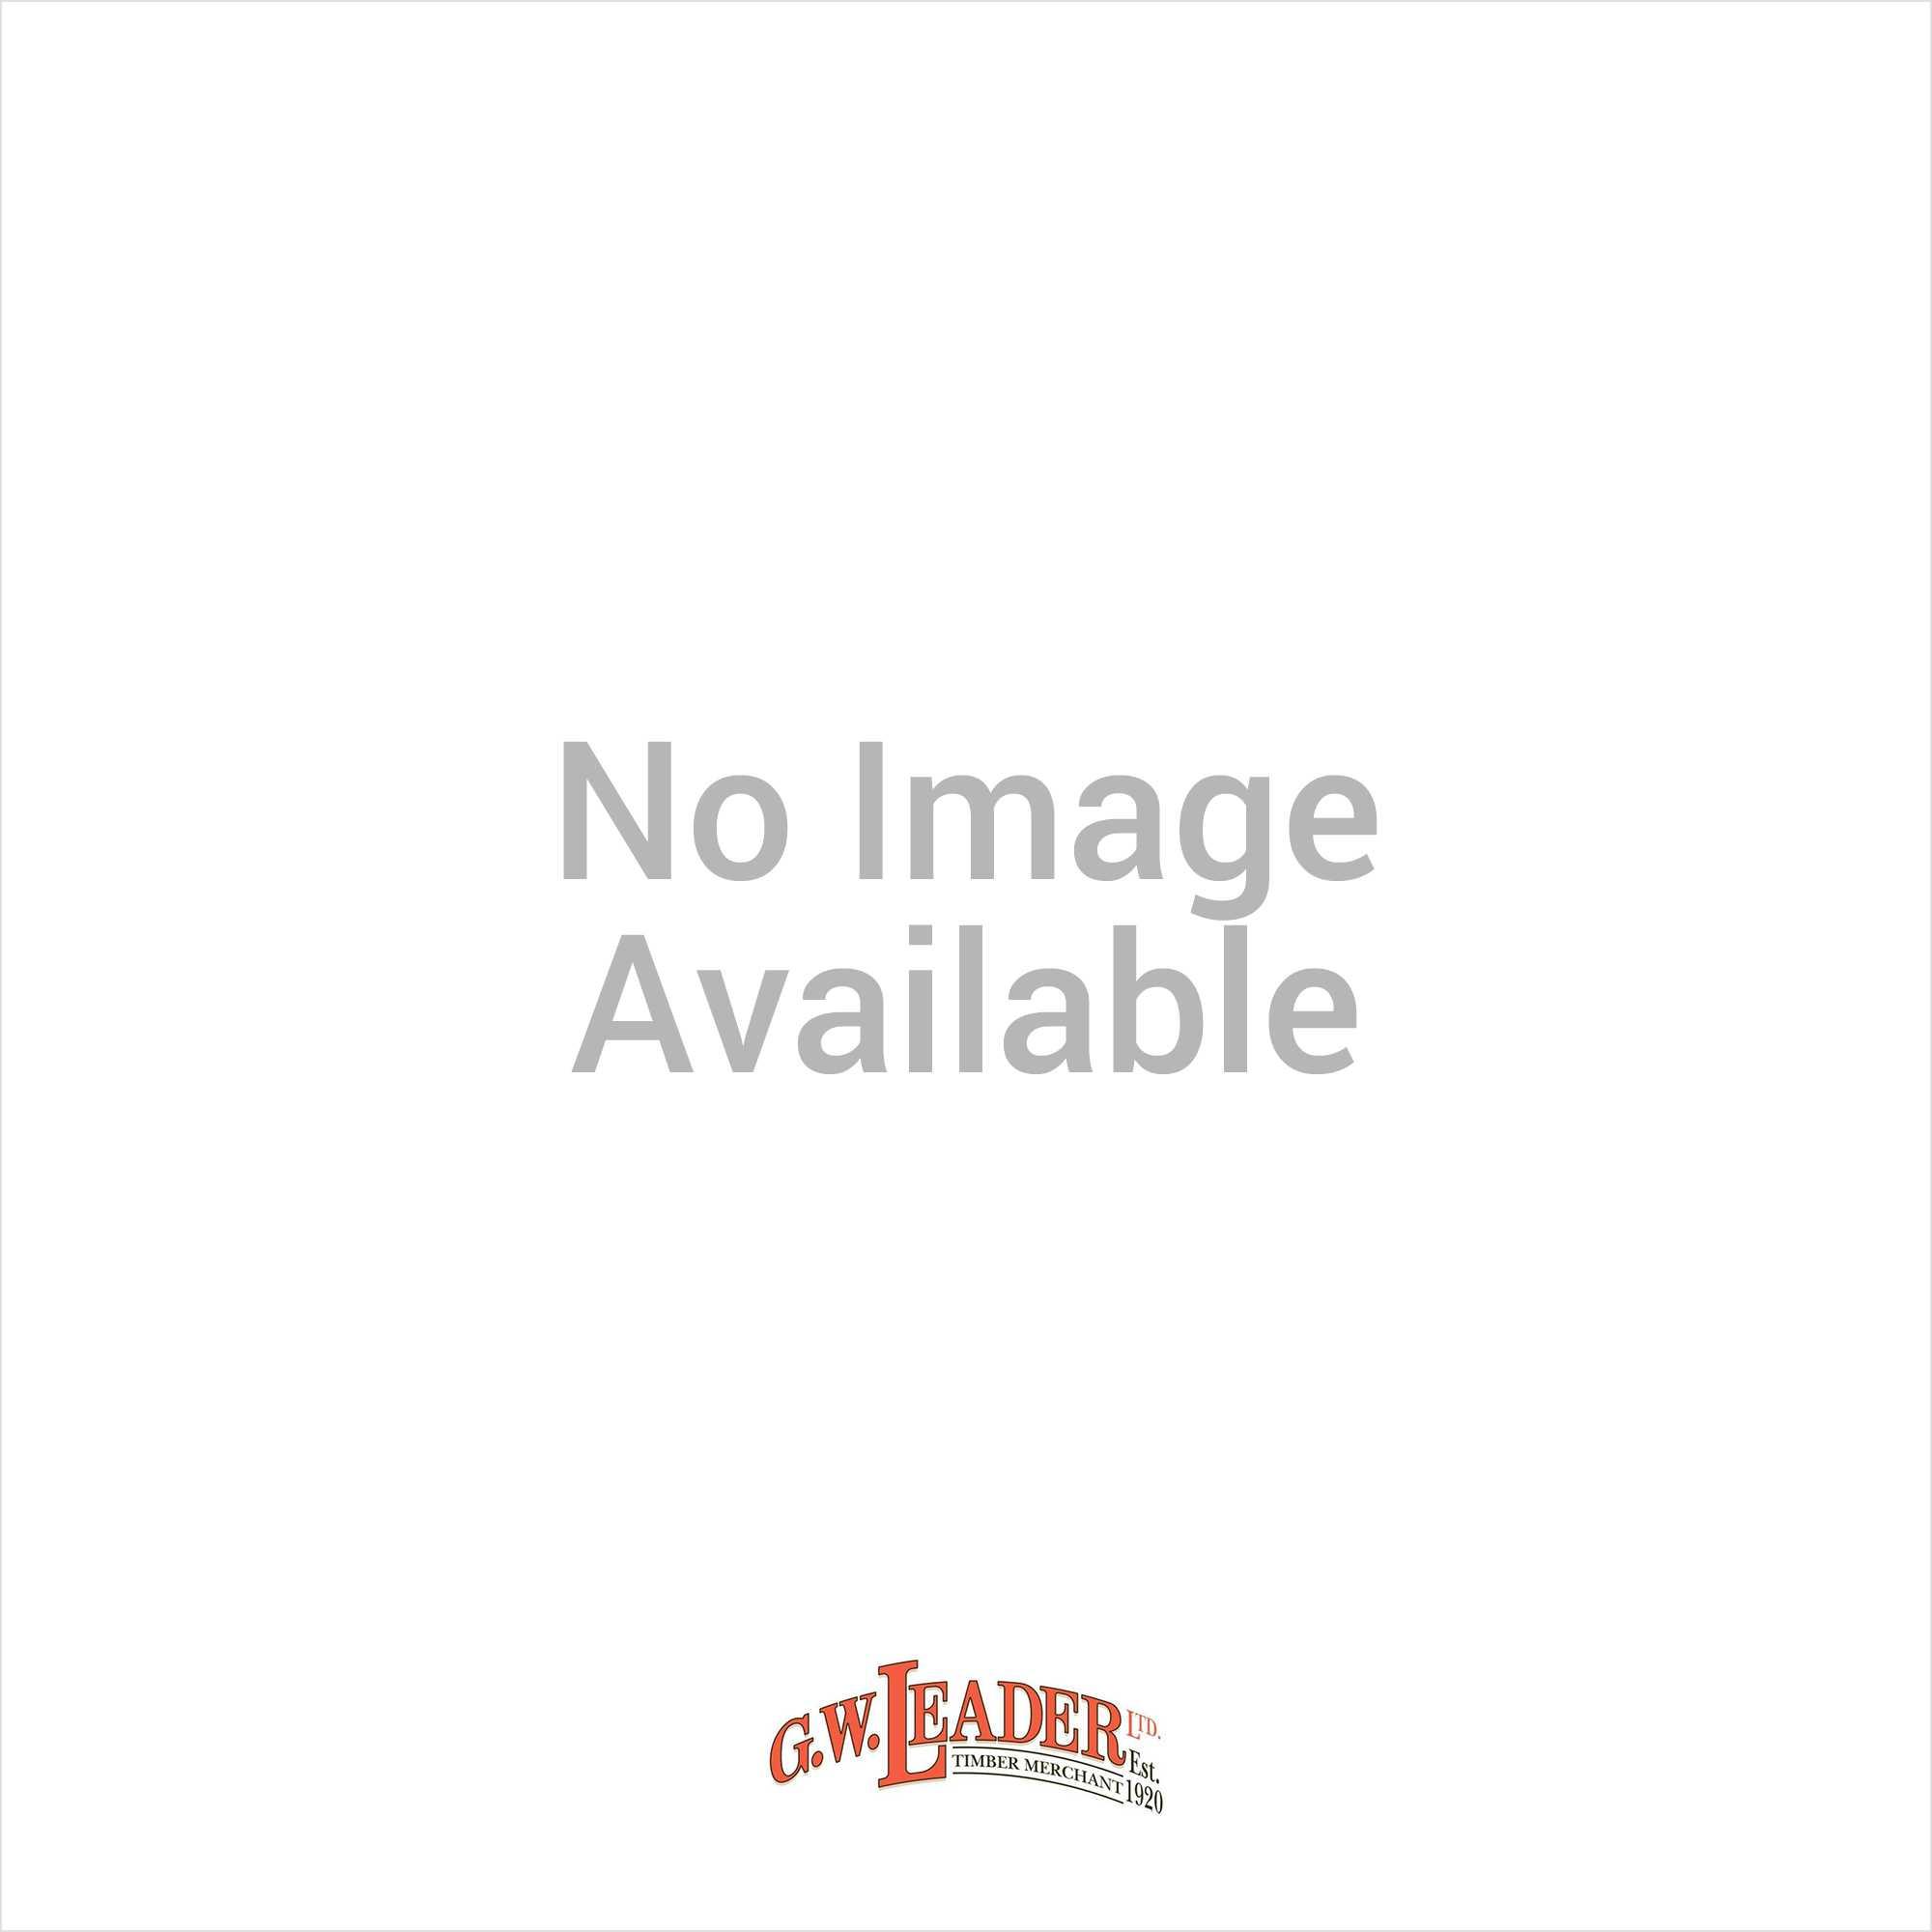 GW Leader Pearwood 15mm Contiplas Furniture Board